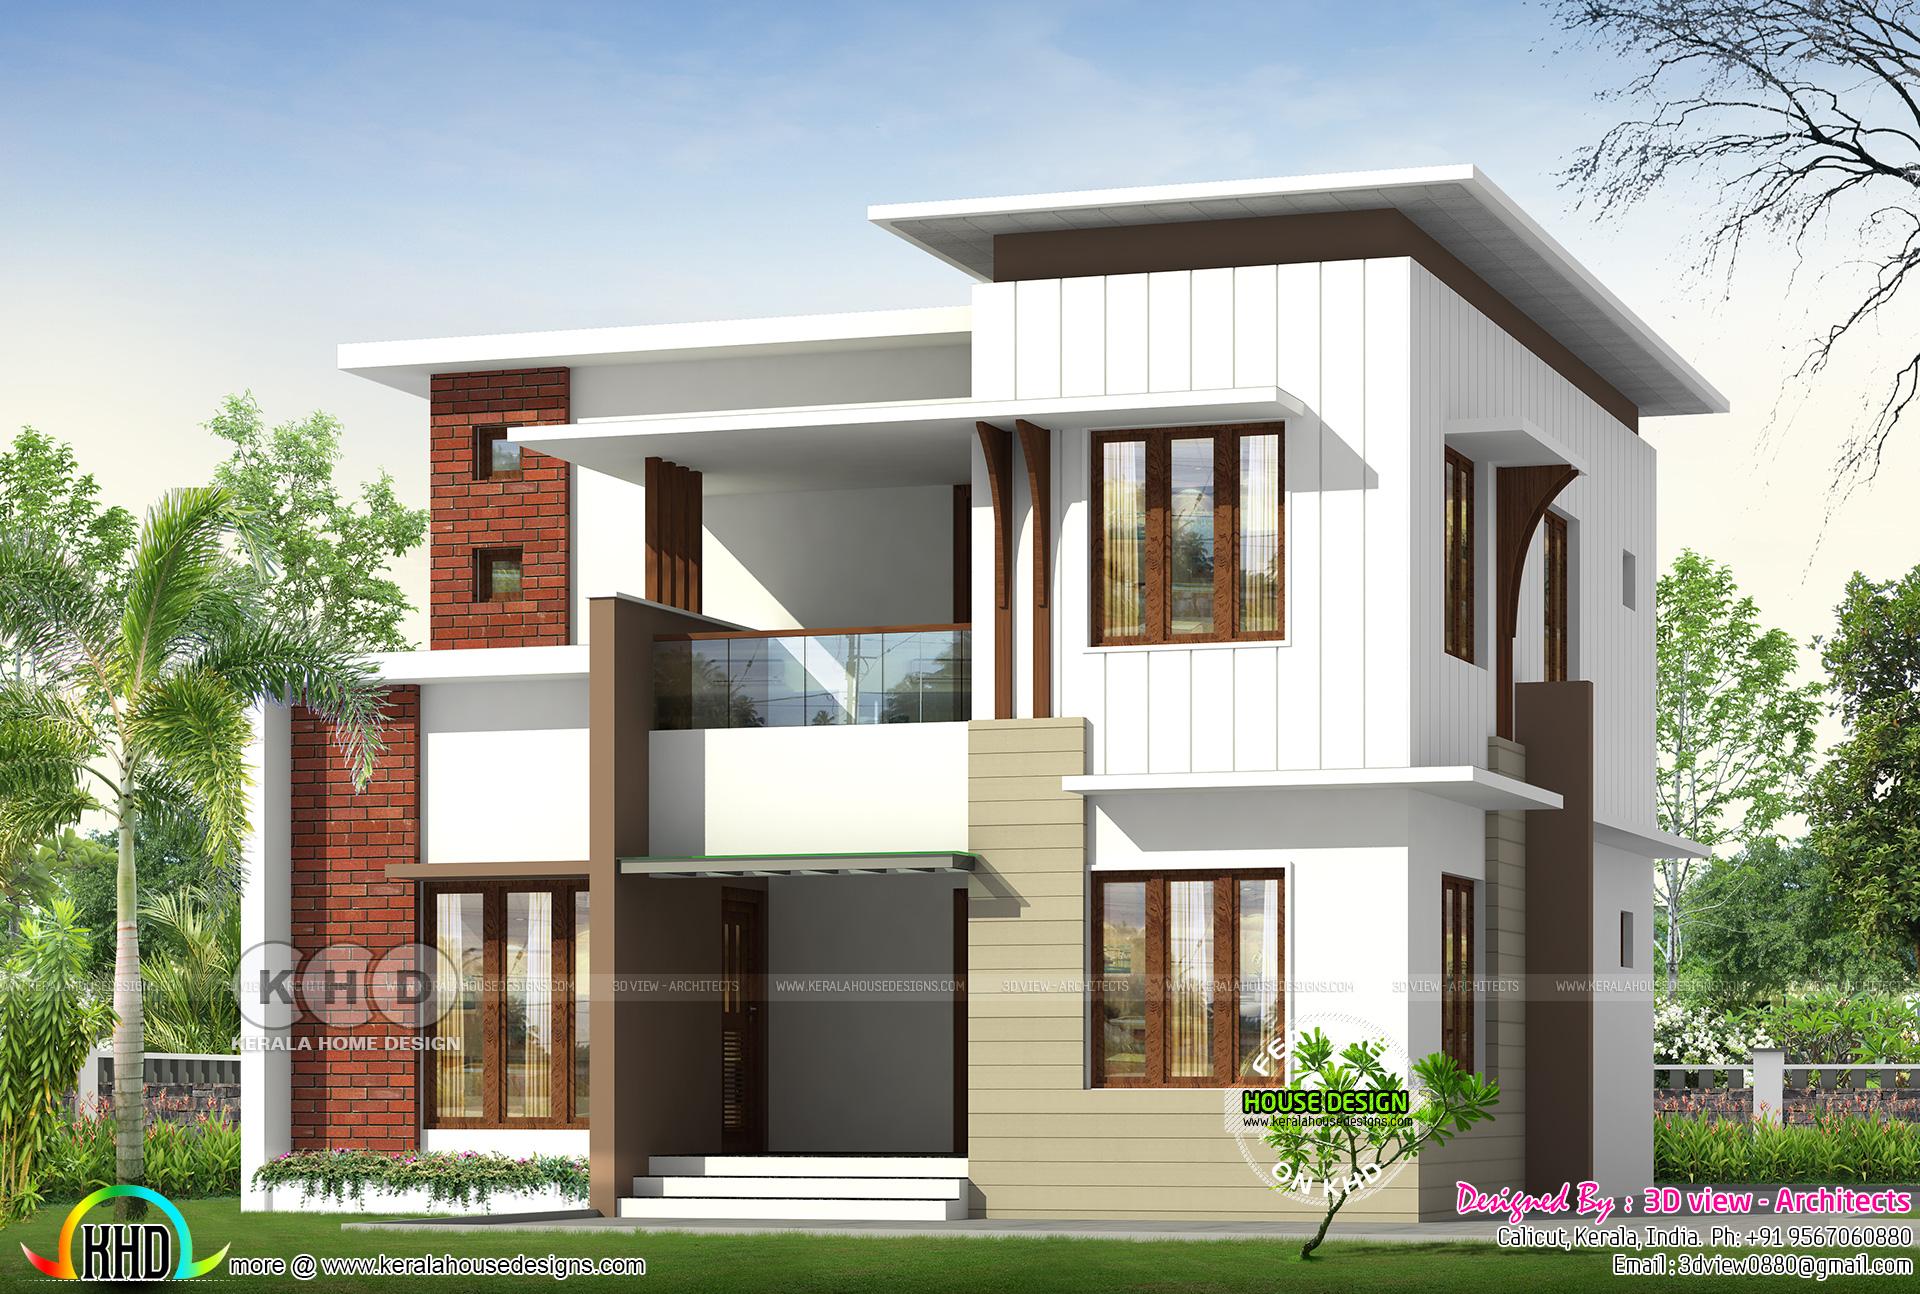 1730 Square Feet 4 Bedroom Flat Roof Home Design Kerala Home Design Bloglovin